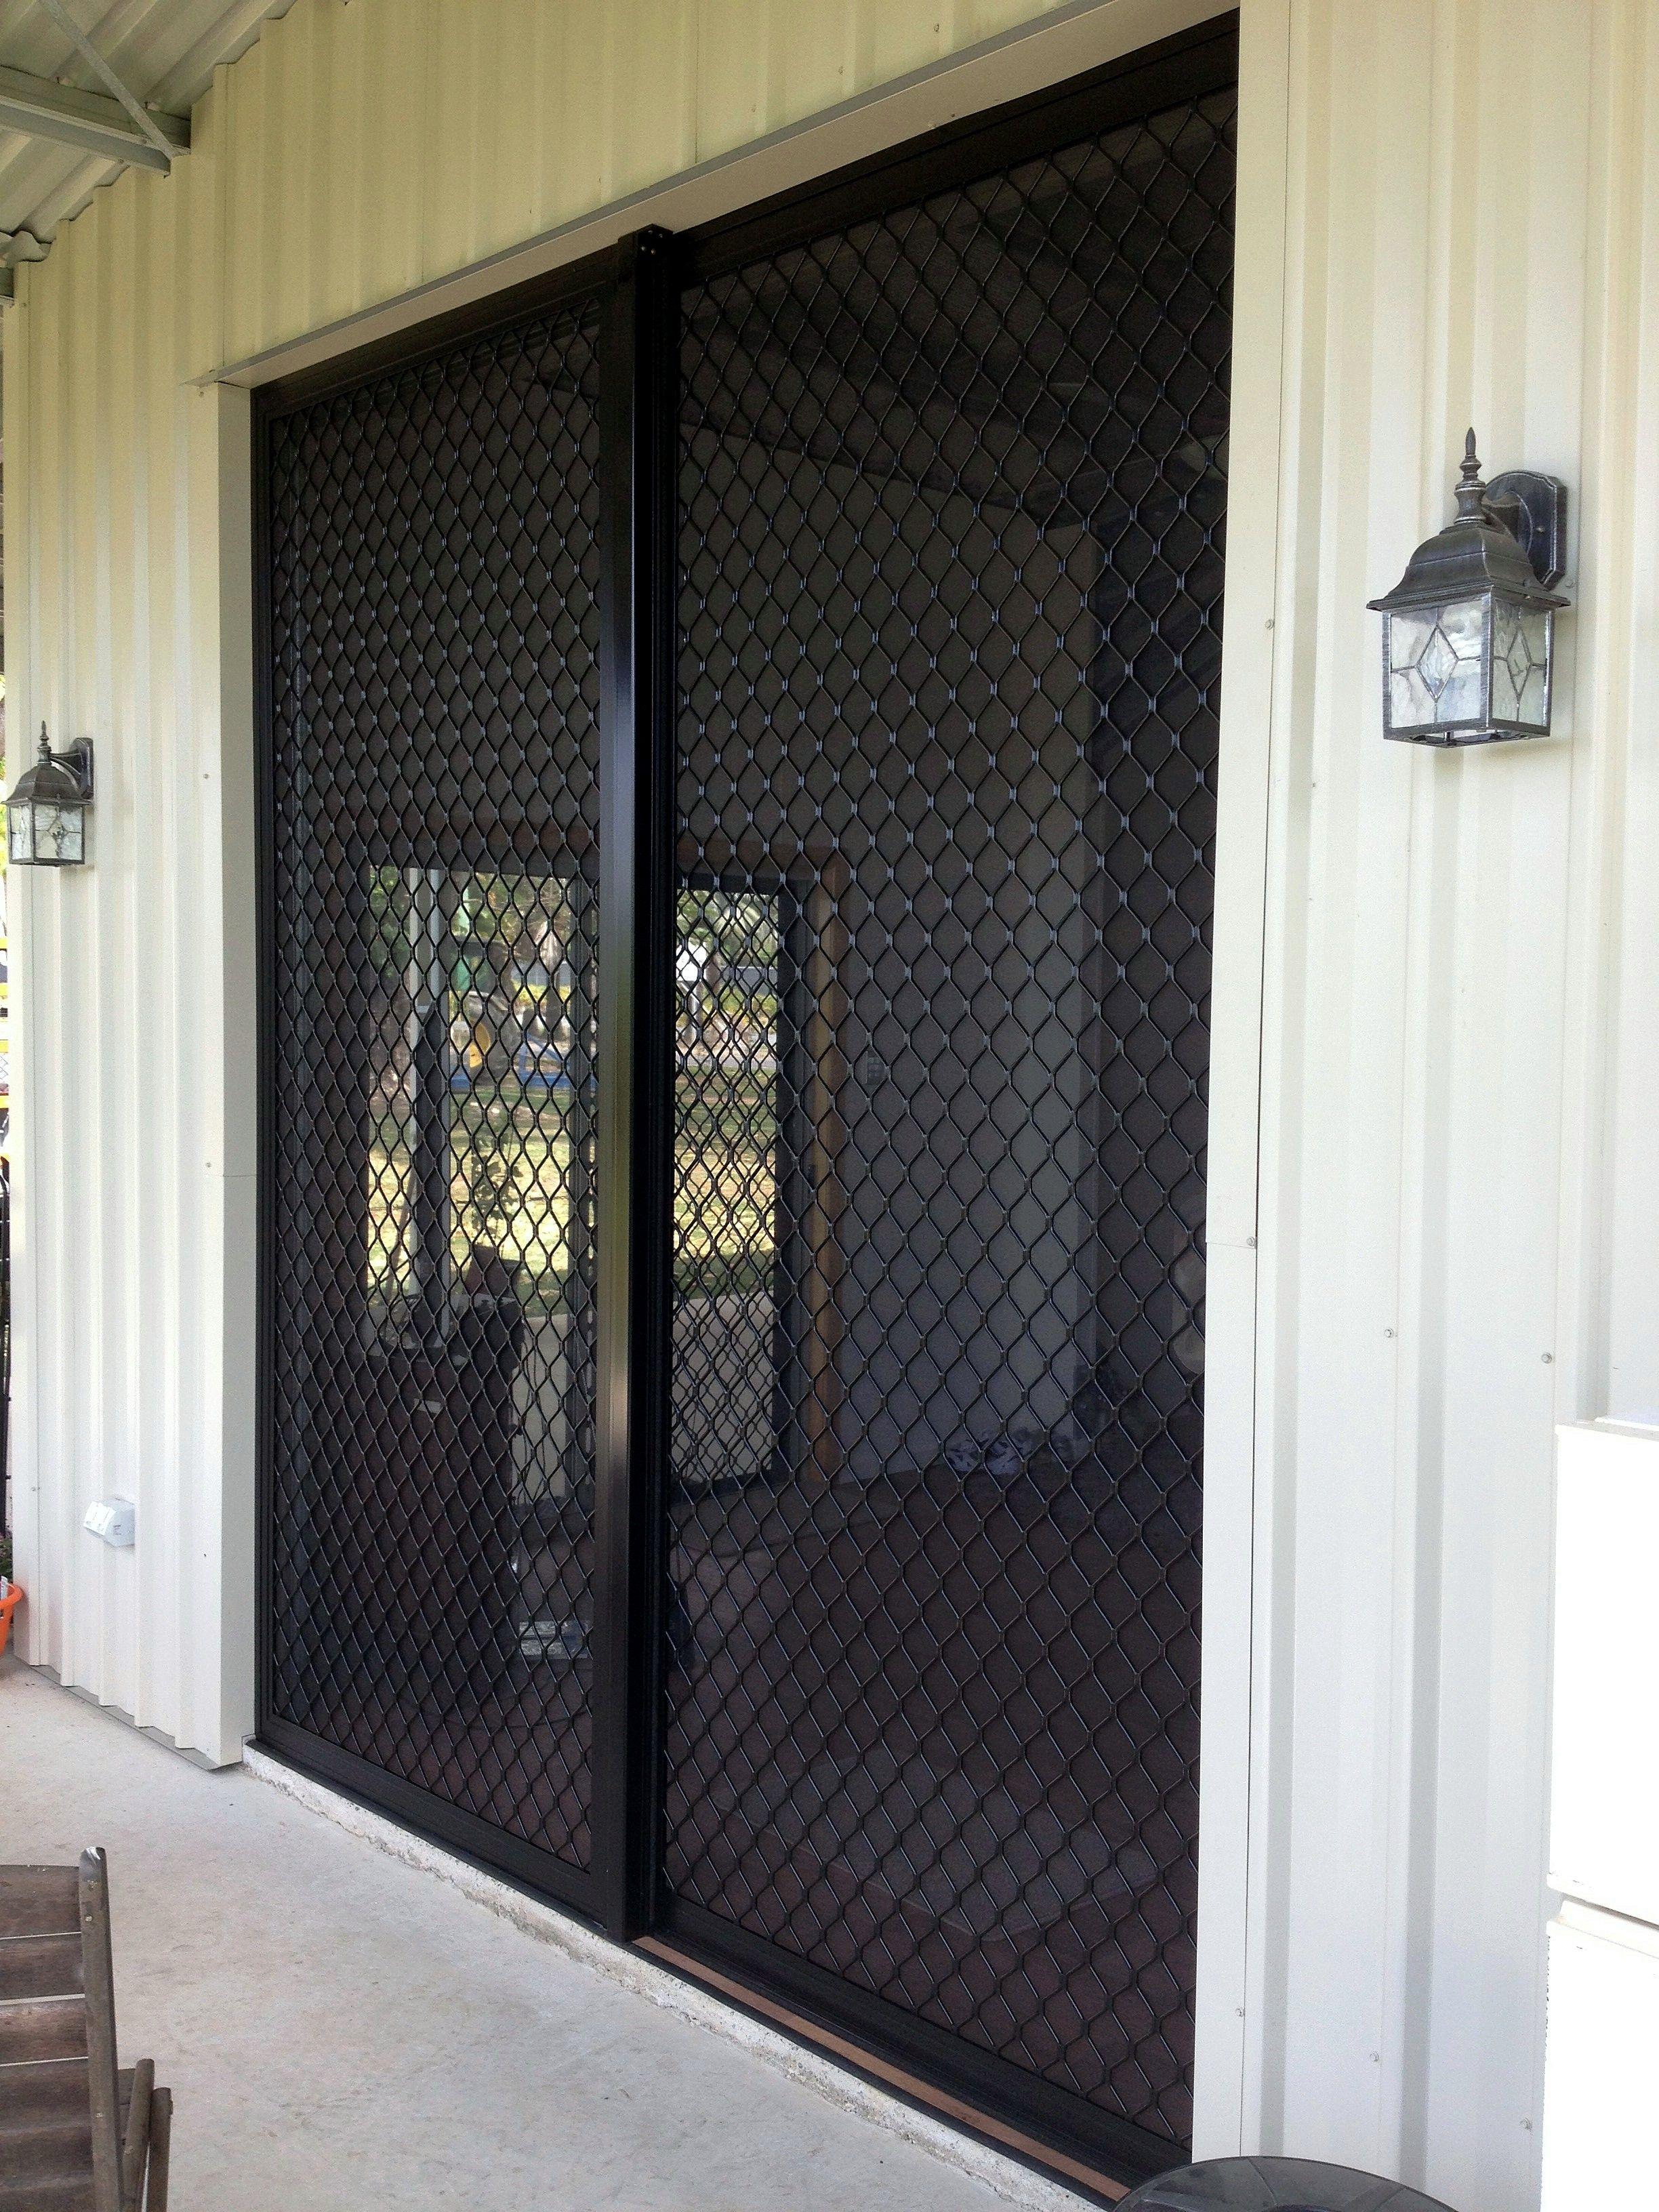 Sliding Security Screen Doors Diamond Grille Pinterest